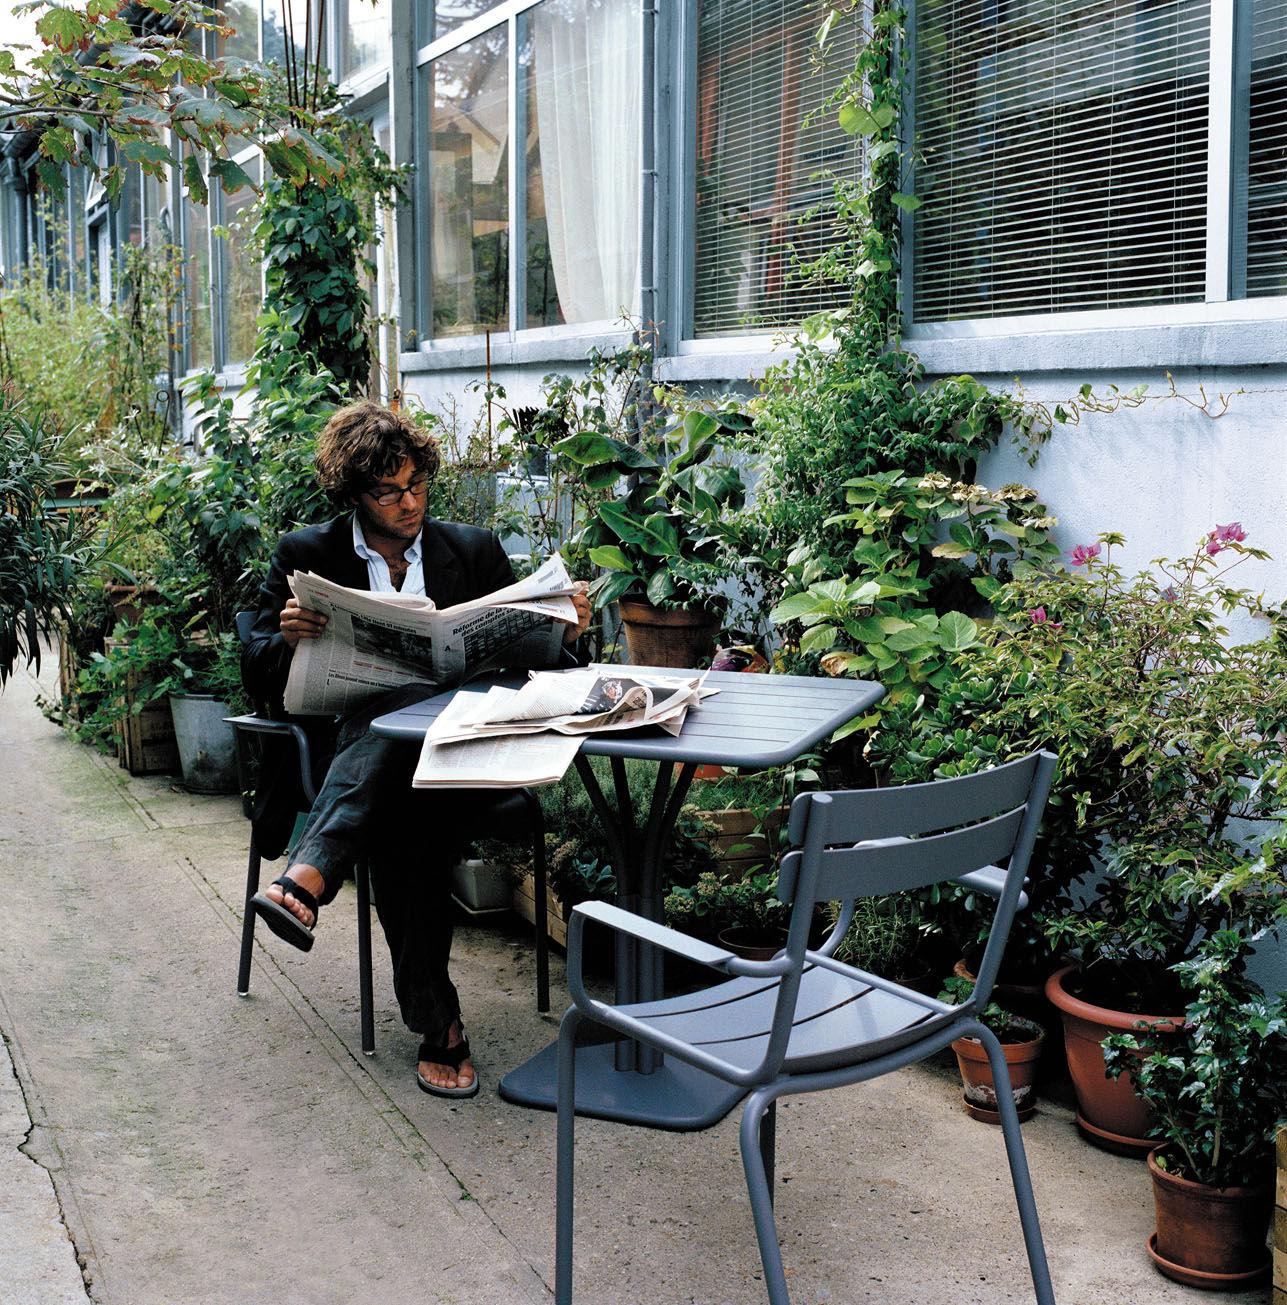 Table de jardin luxembourg 80 x 80 cm pied central - Fermob jardin du luxembourg ...